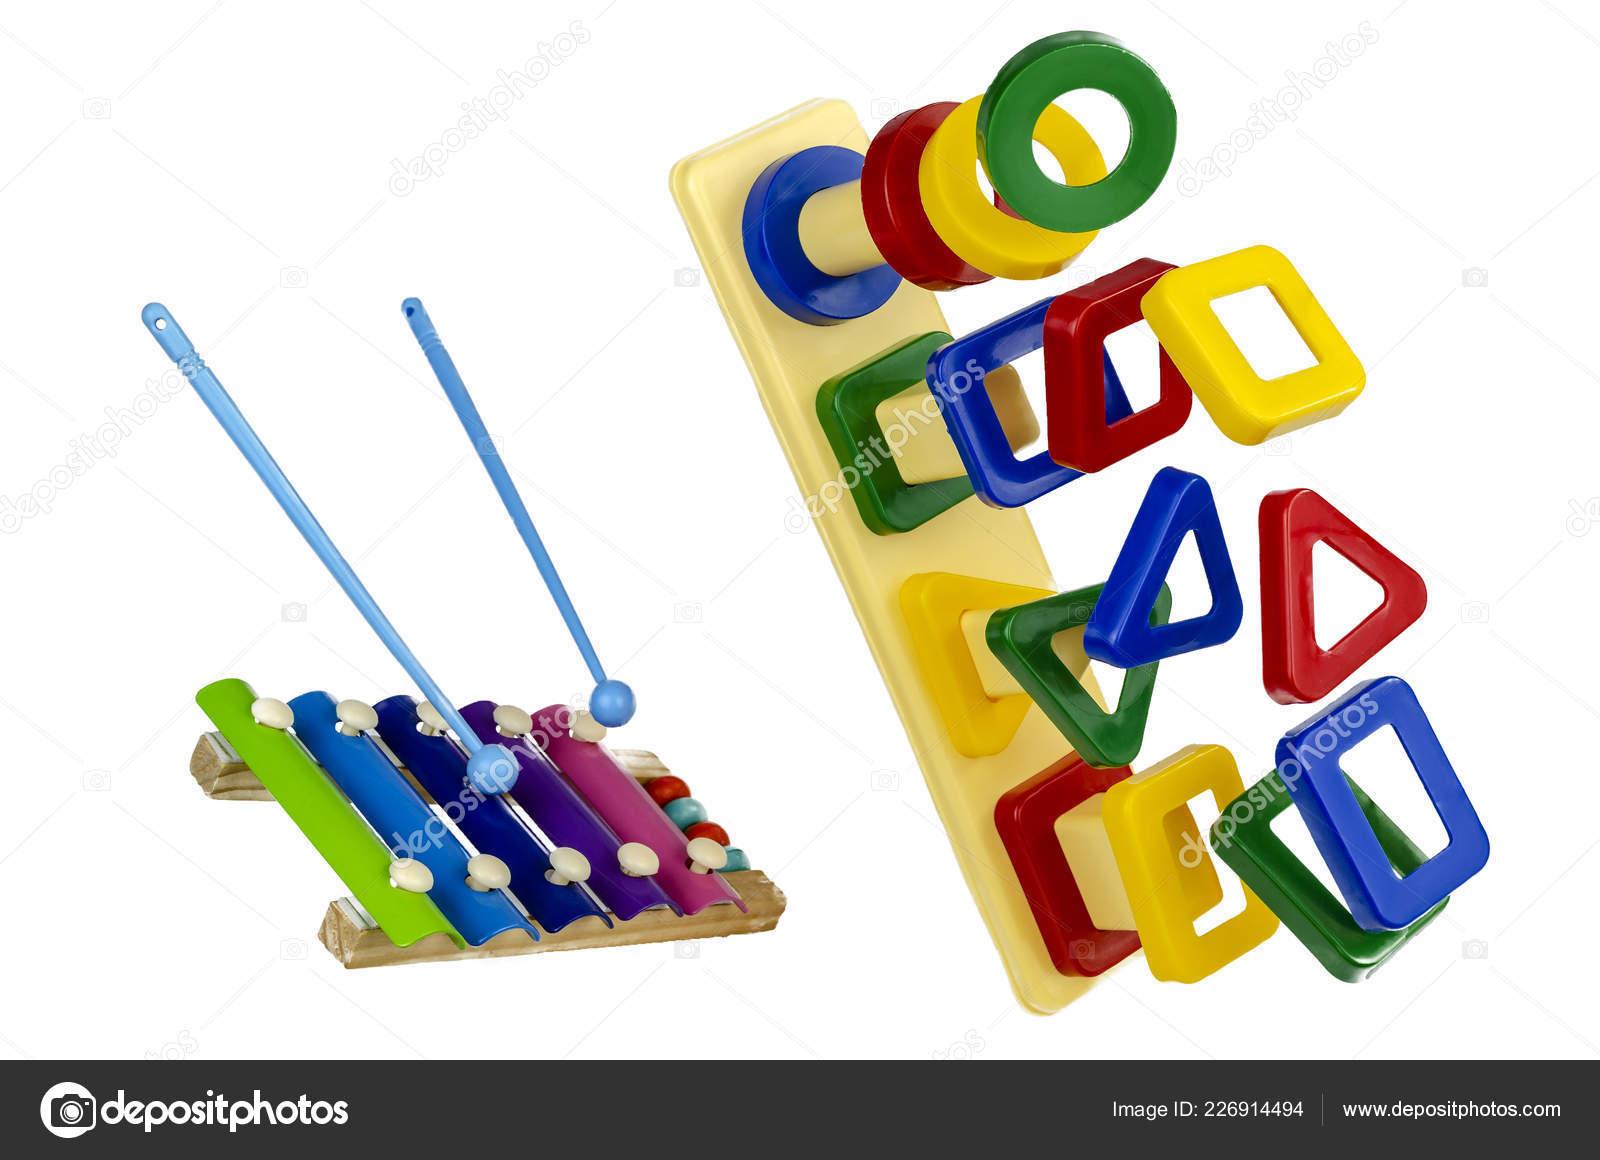 Geometric Shapes Made Plastic Puzzle Preschool Children